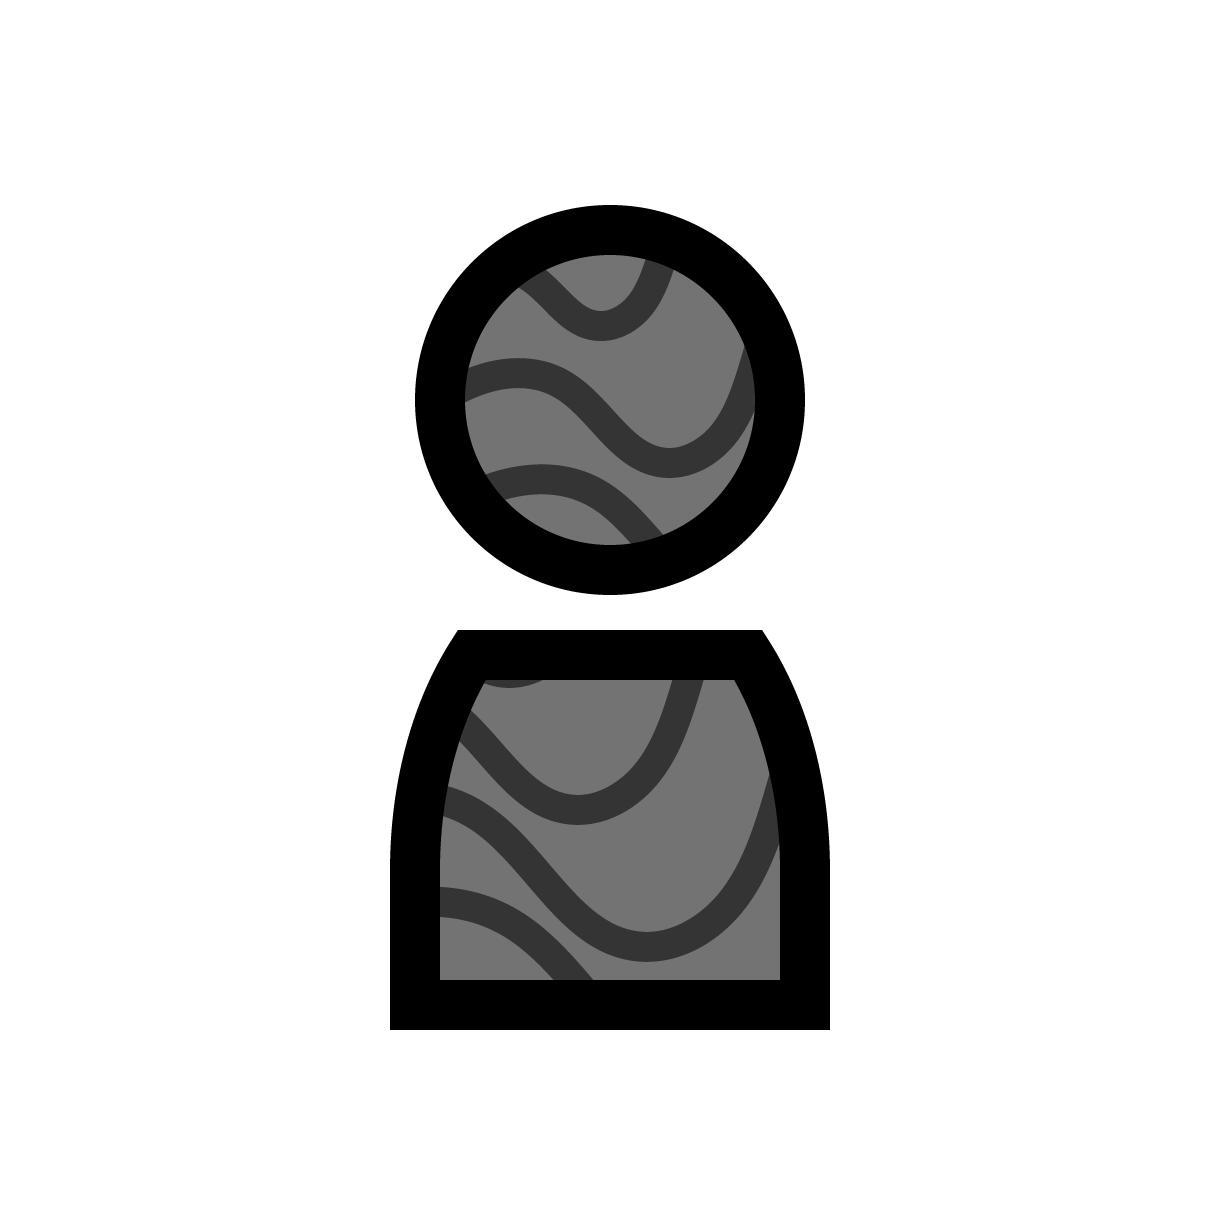 atlas_icon_users-01